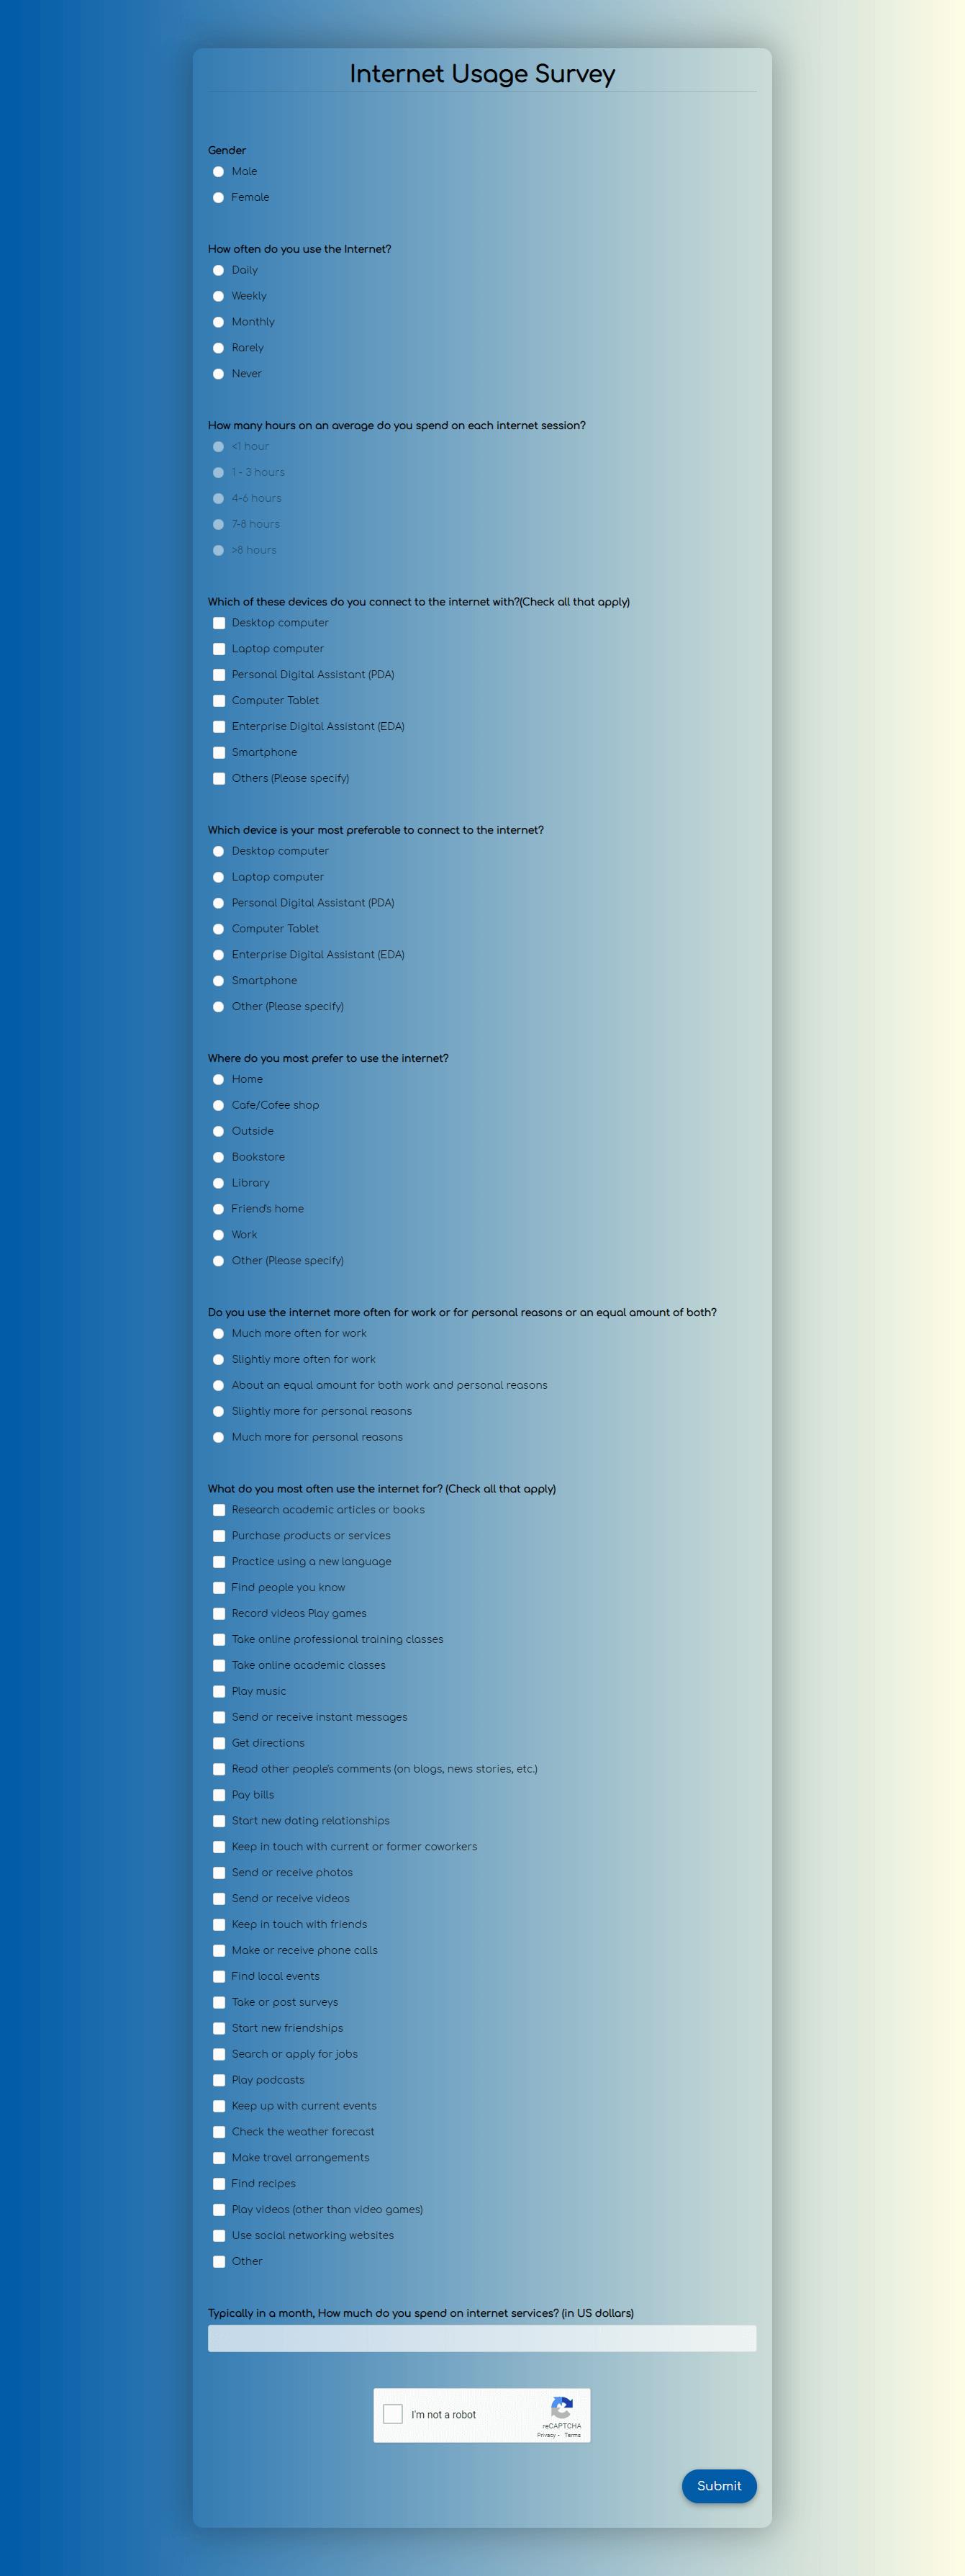 Internet Usage Survey Template template